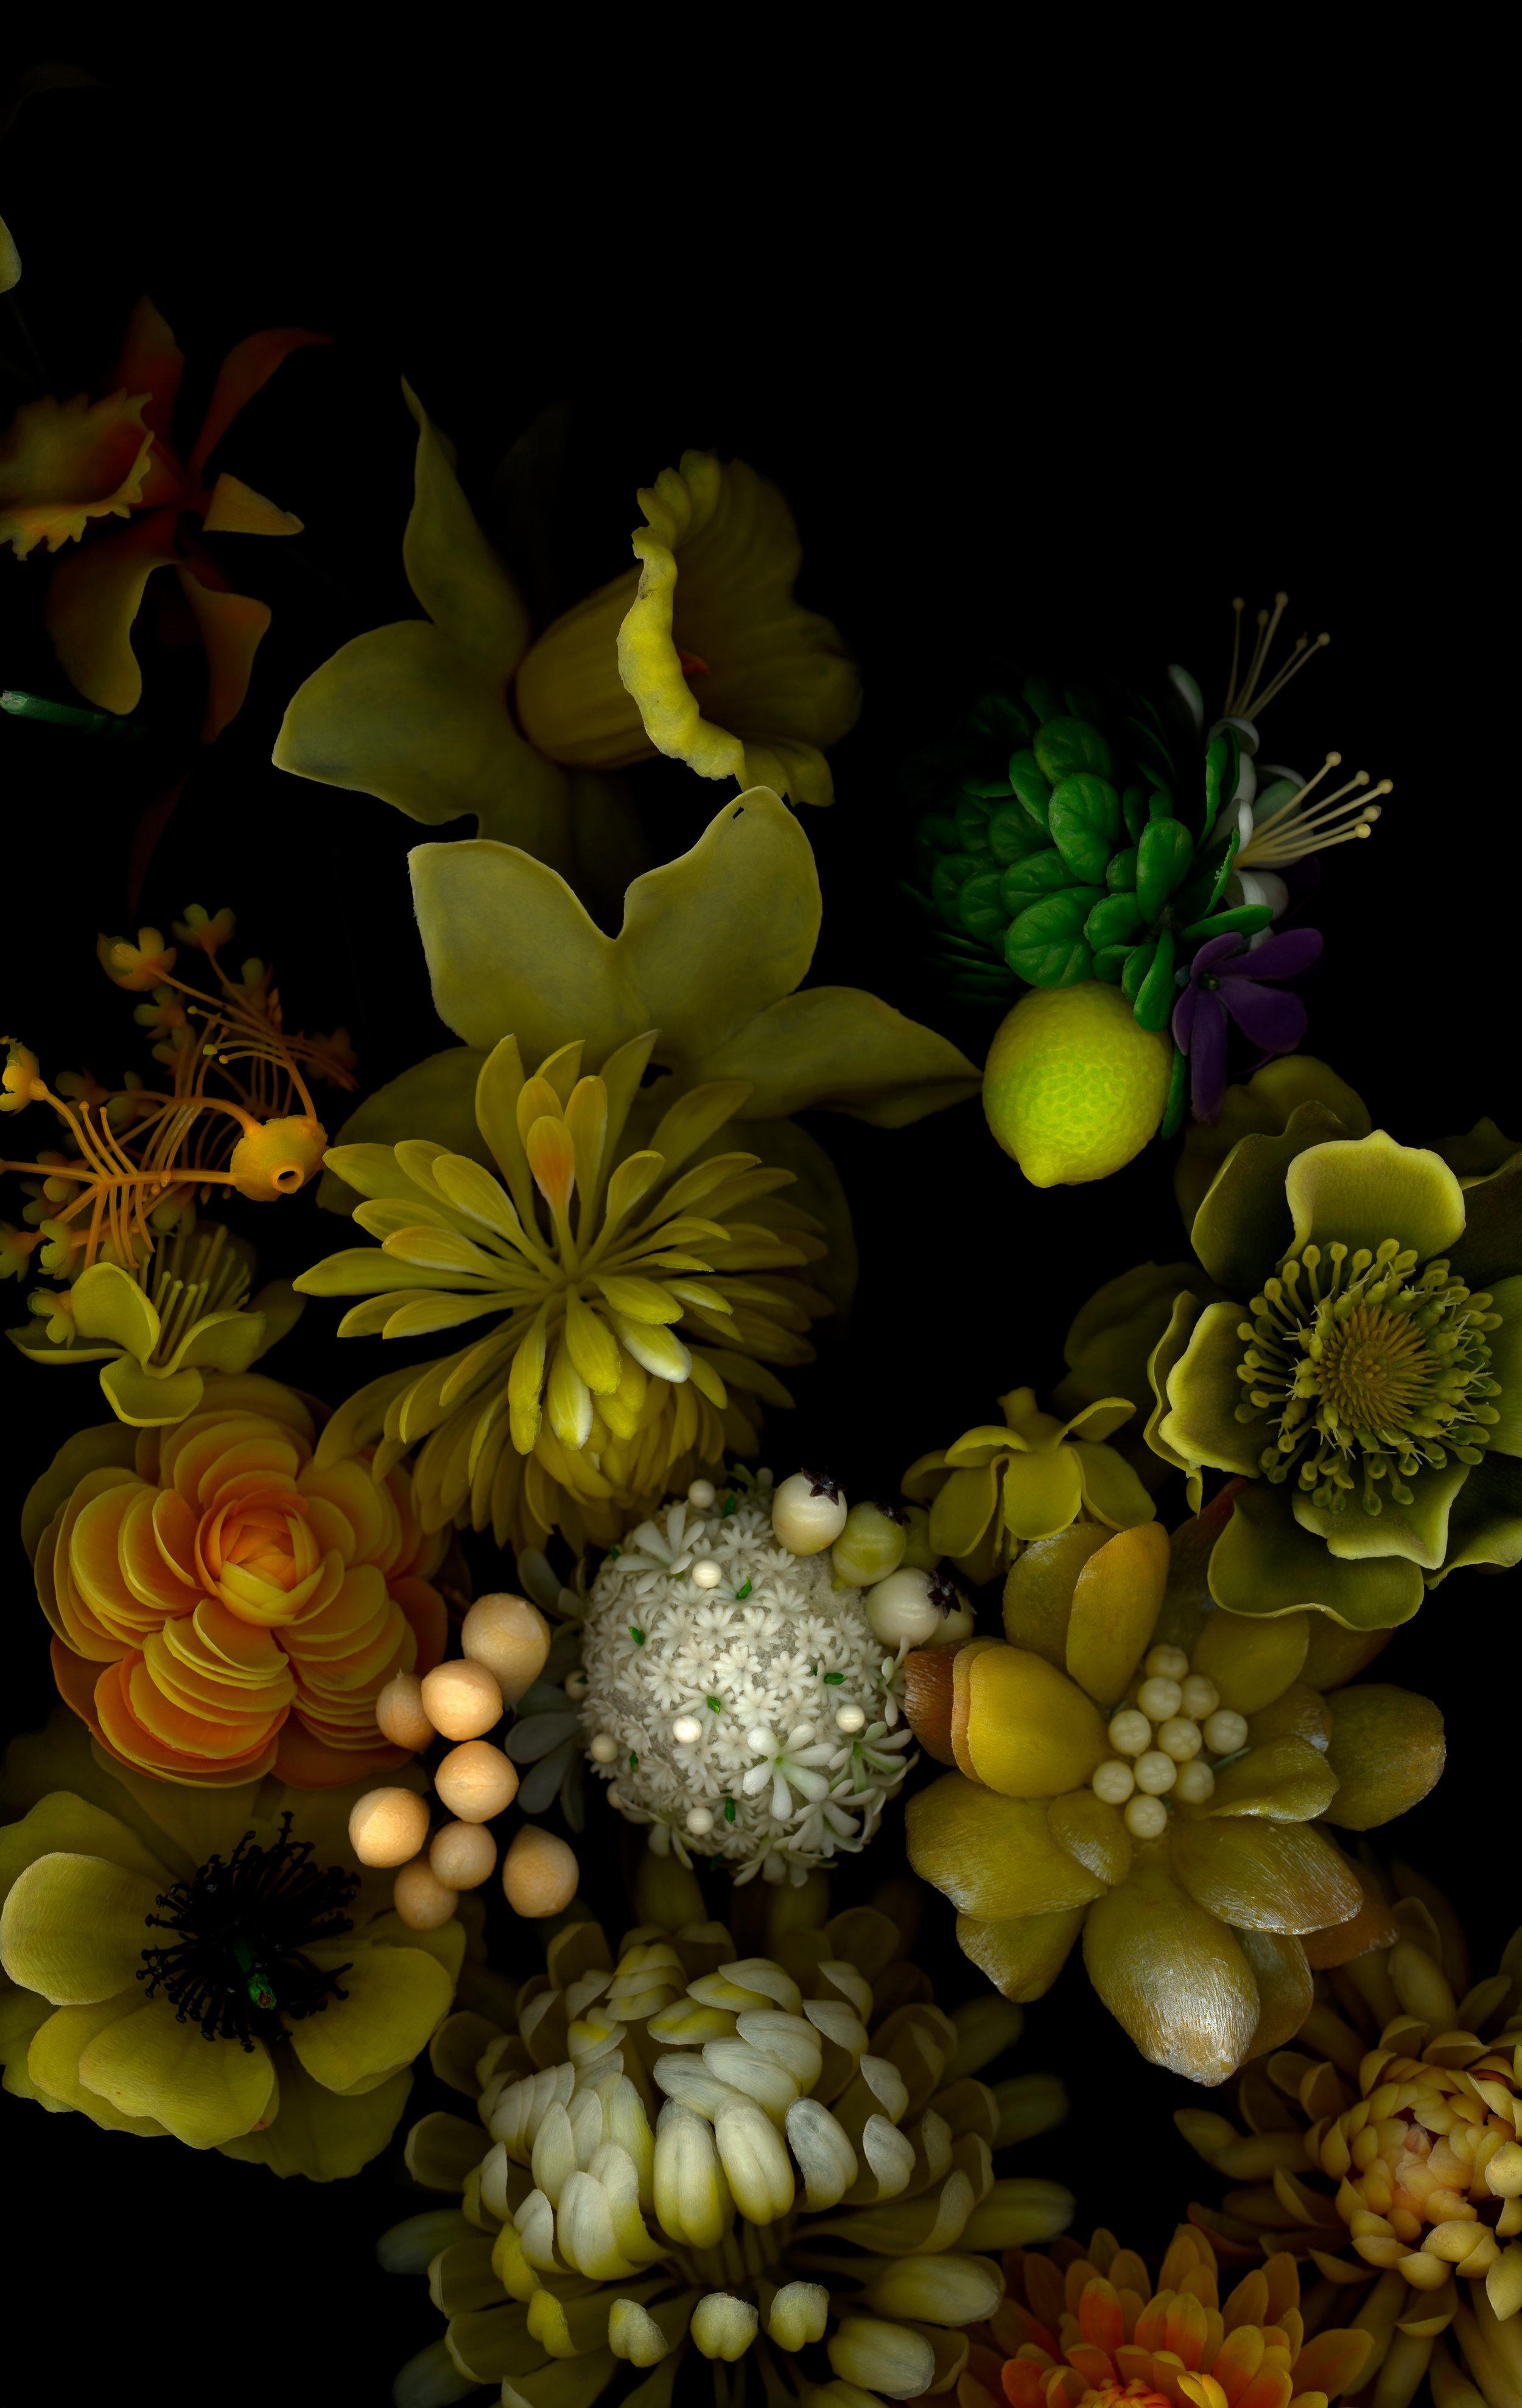 "yellows, bioposy #1,digital c print, 2007, 42"" x 67"""